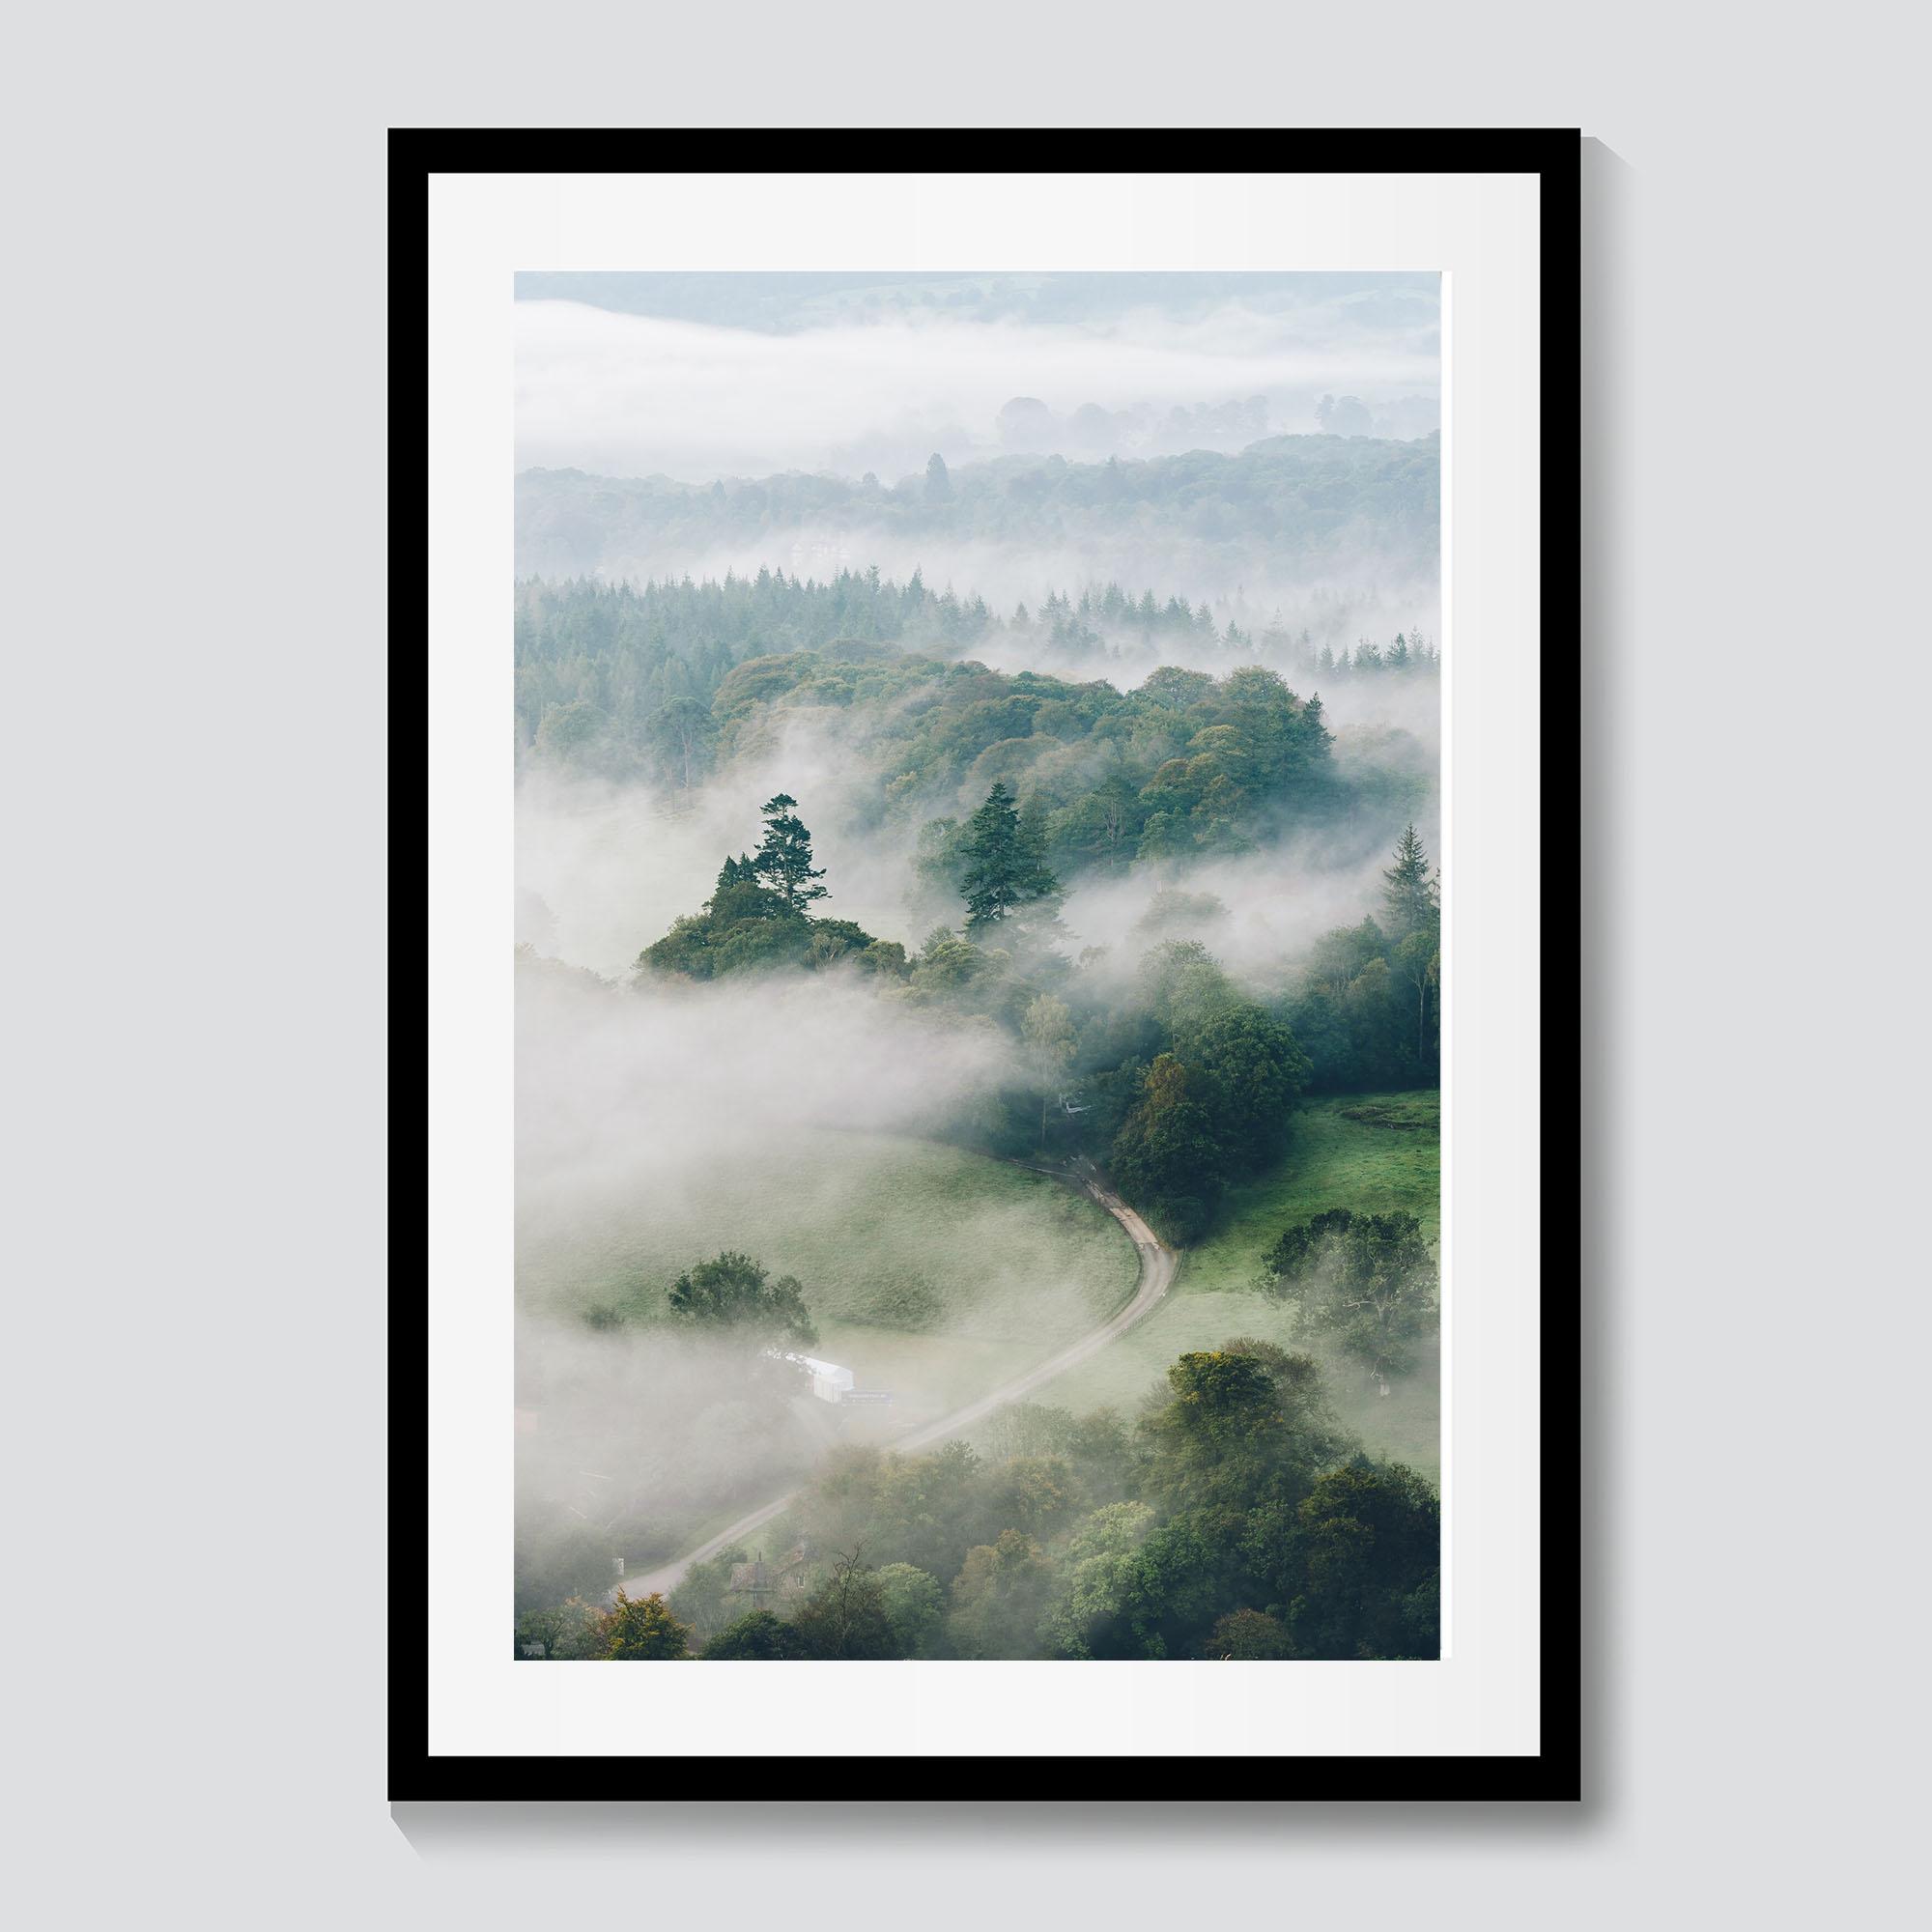 Evergreen Mist | Lake District Photography Prints | CAlum Lewis photography